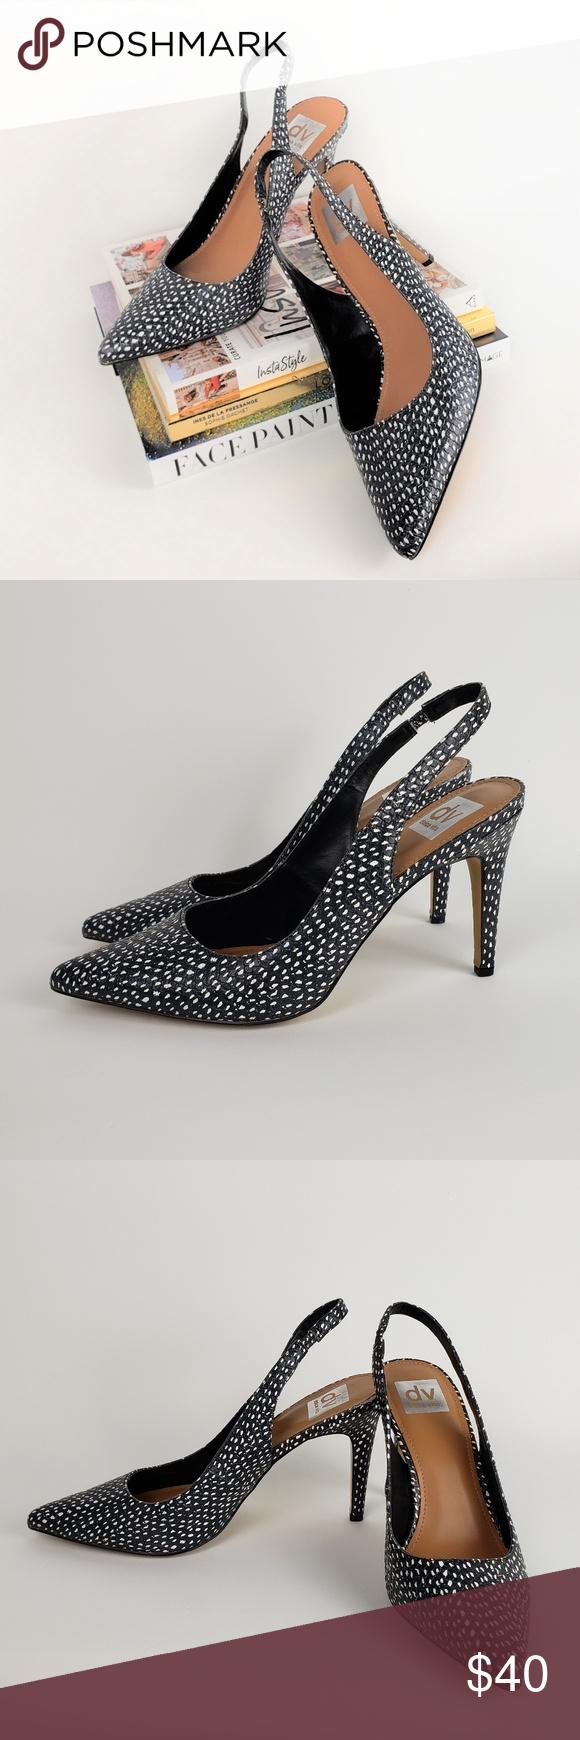 Dolce Vita Black White Slingback Pumps 9 Shoes Women Heels Slingback Pump Dolce Vita Shoes